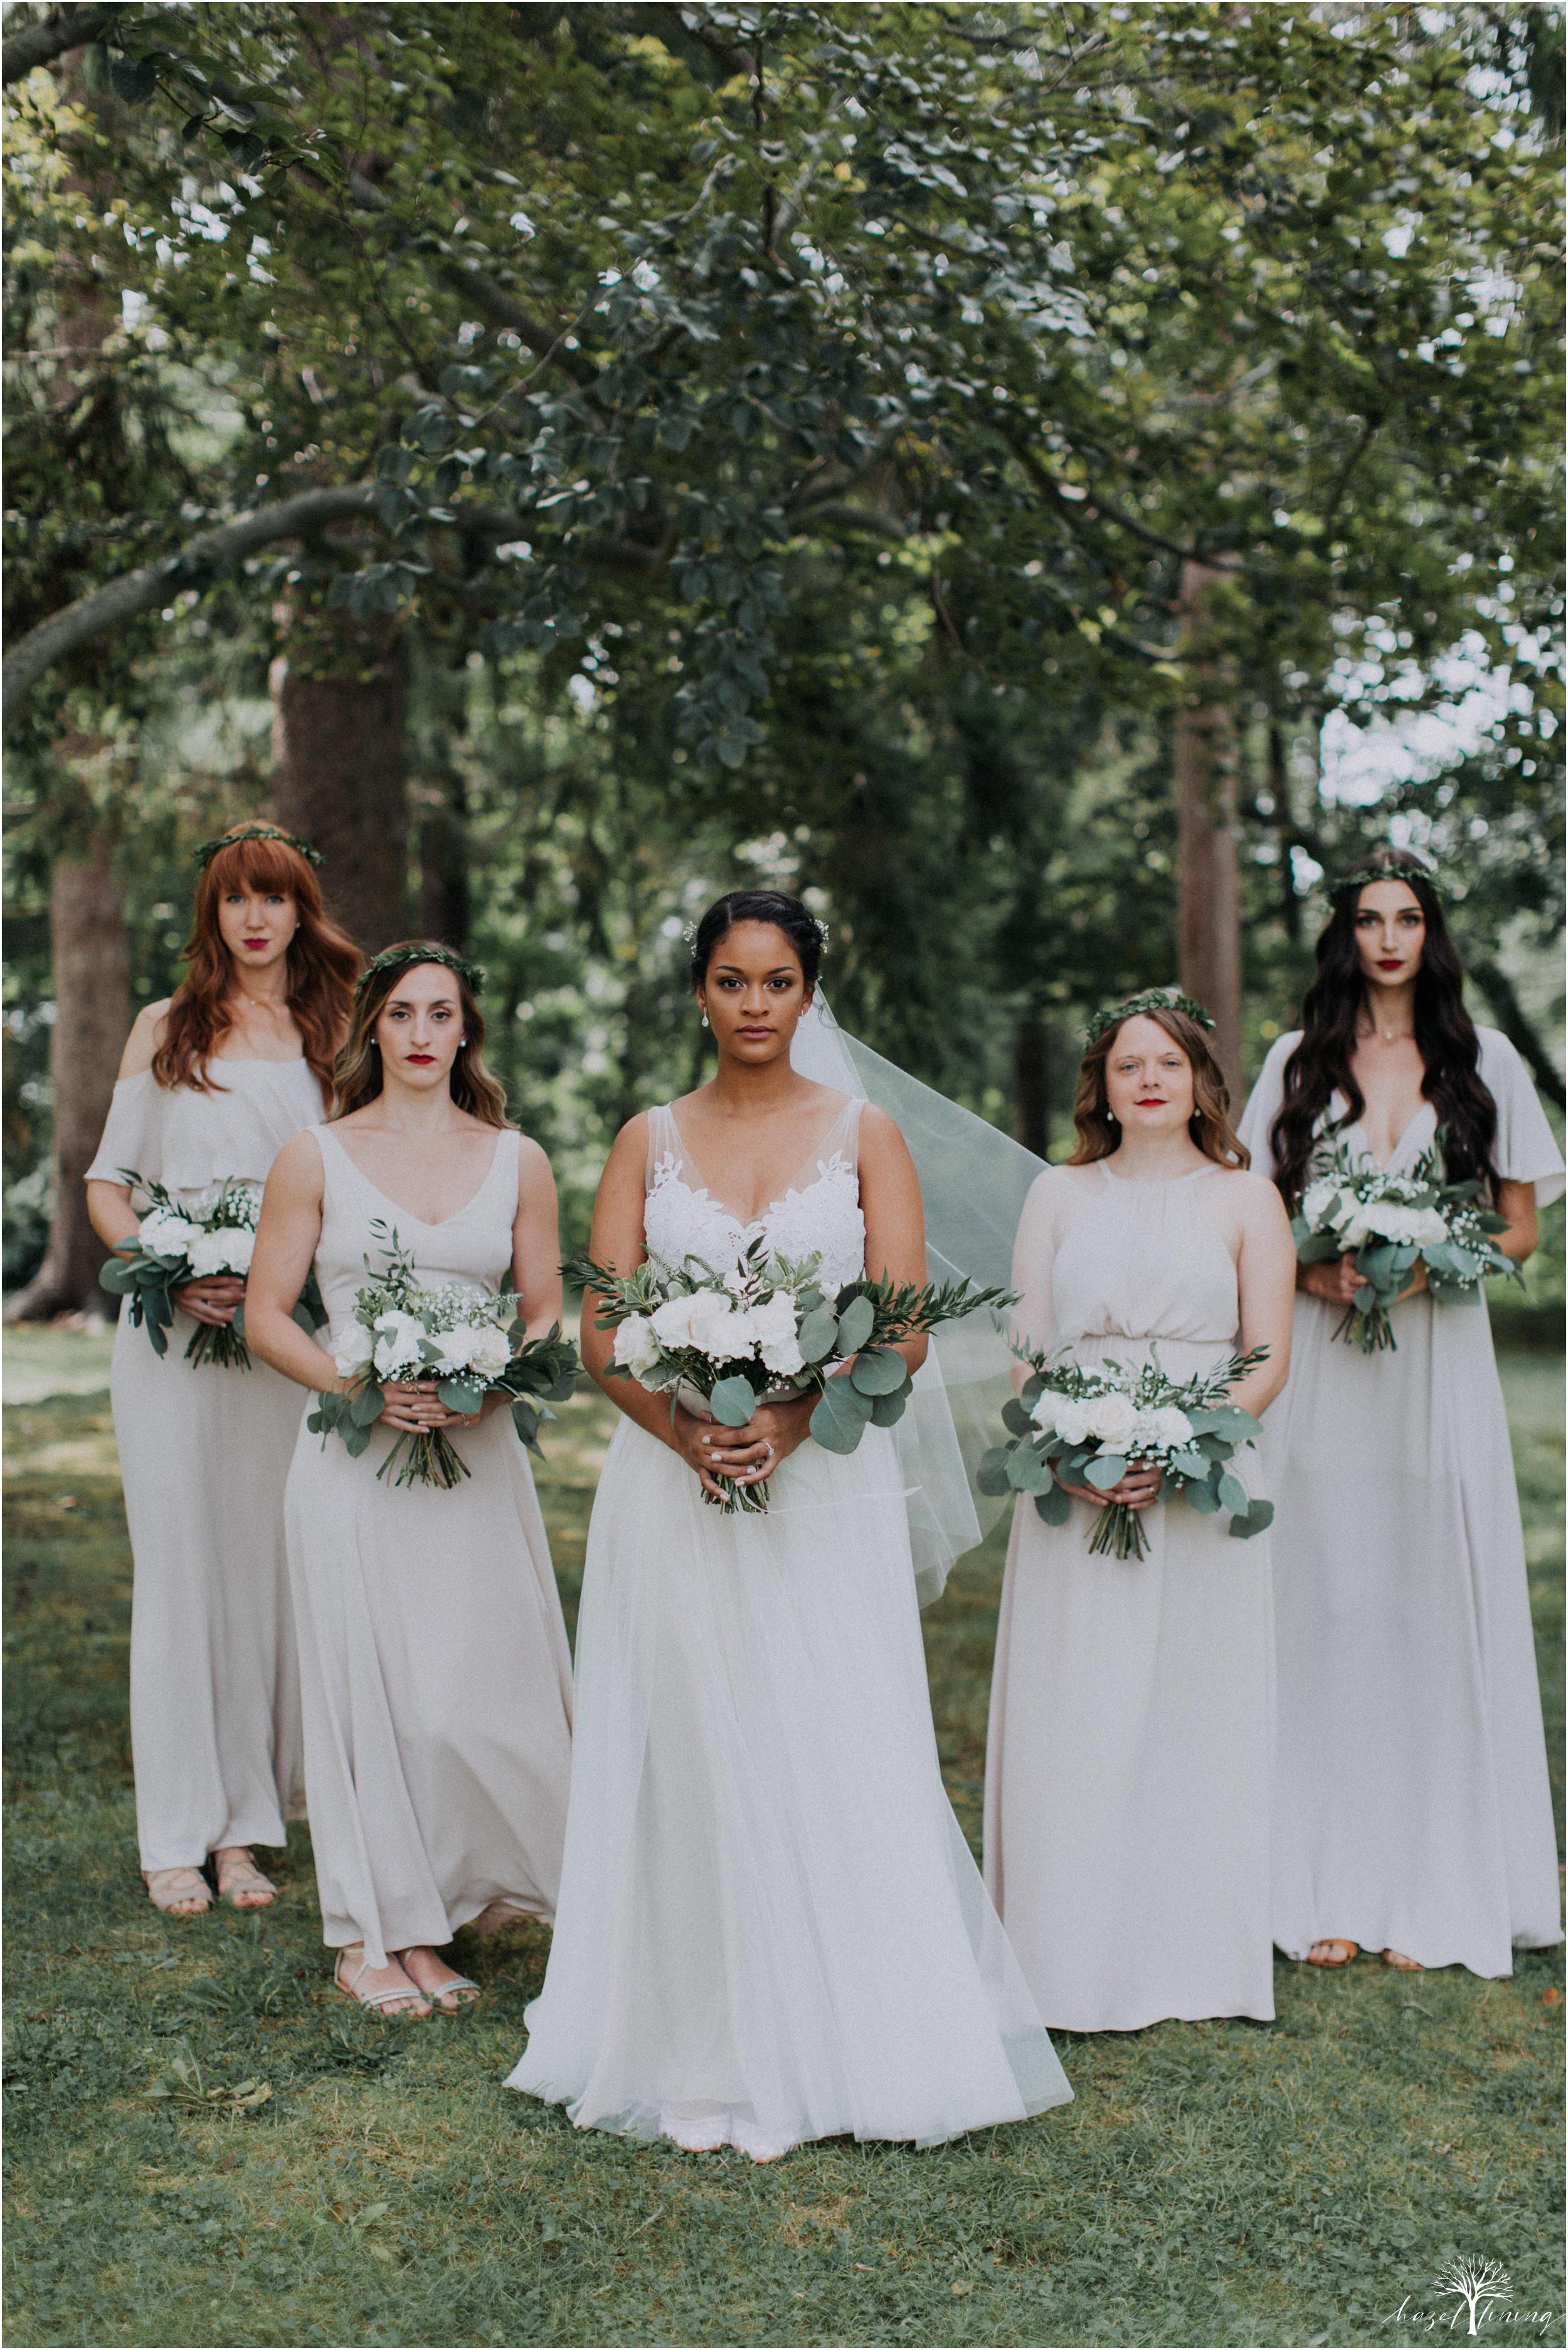 mariah-kreyling-samuel-sherratt-sherrattwiththeworld-peirce-farm-at-witch-hill-boston-massachusetts-wedding-photography-hazel-lining-travel-wedding-elopement-photography_0032.jpg